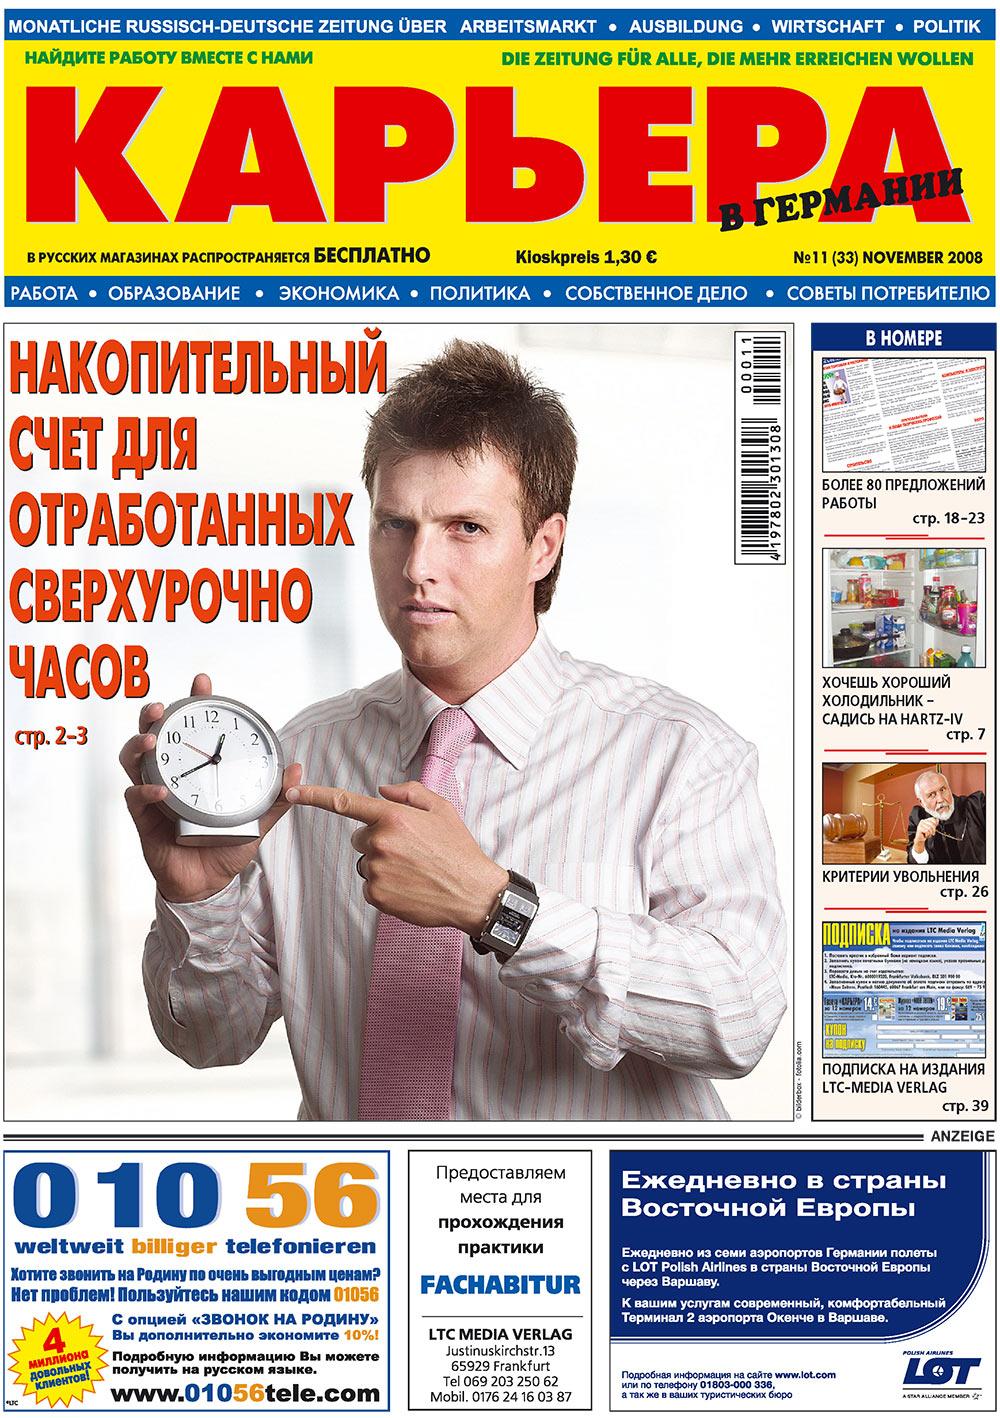 Карьера (газета). 2008 год, номер 11, стр. 1